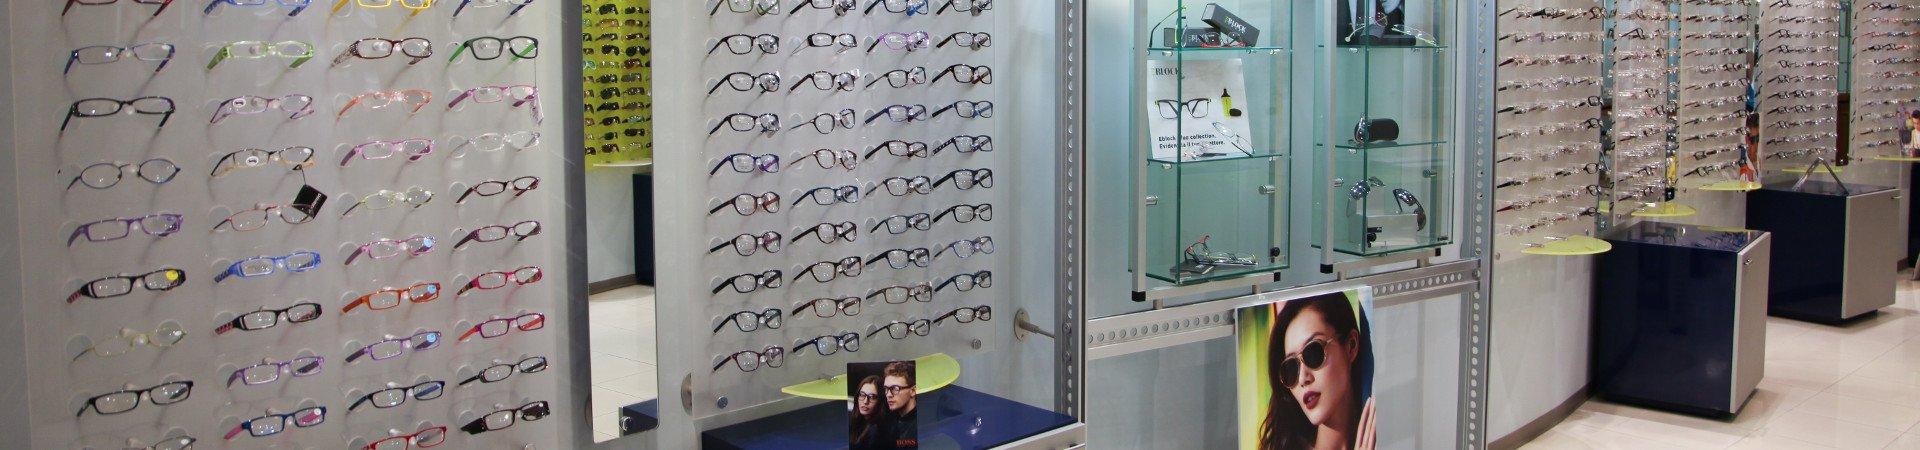 Display of glasses from Ottica Brigida.